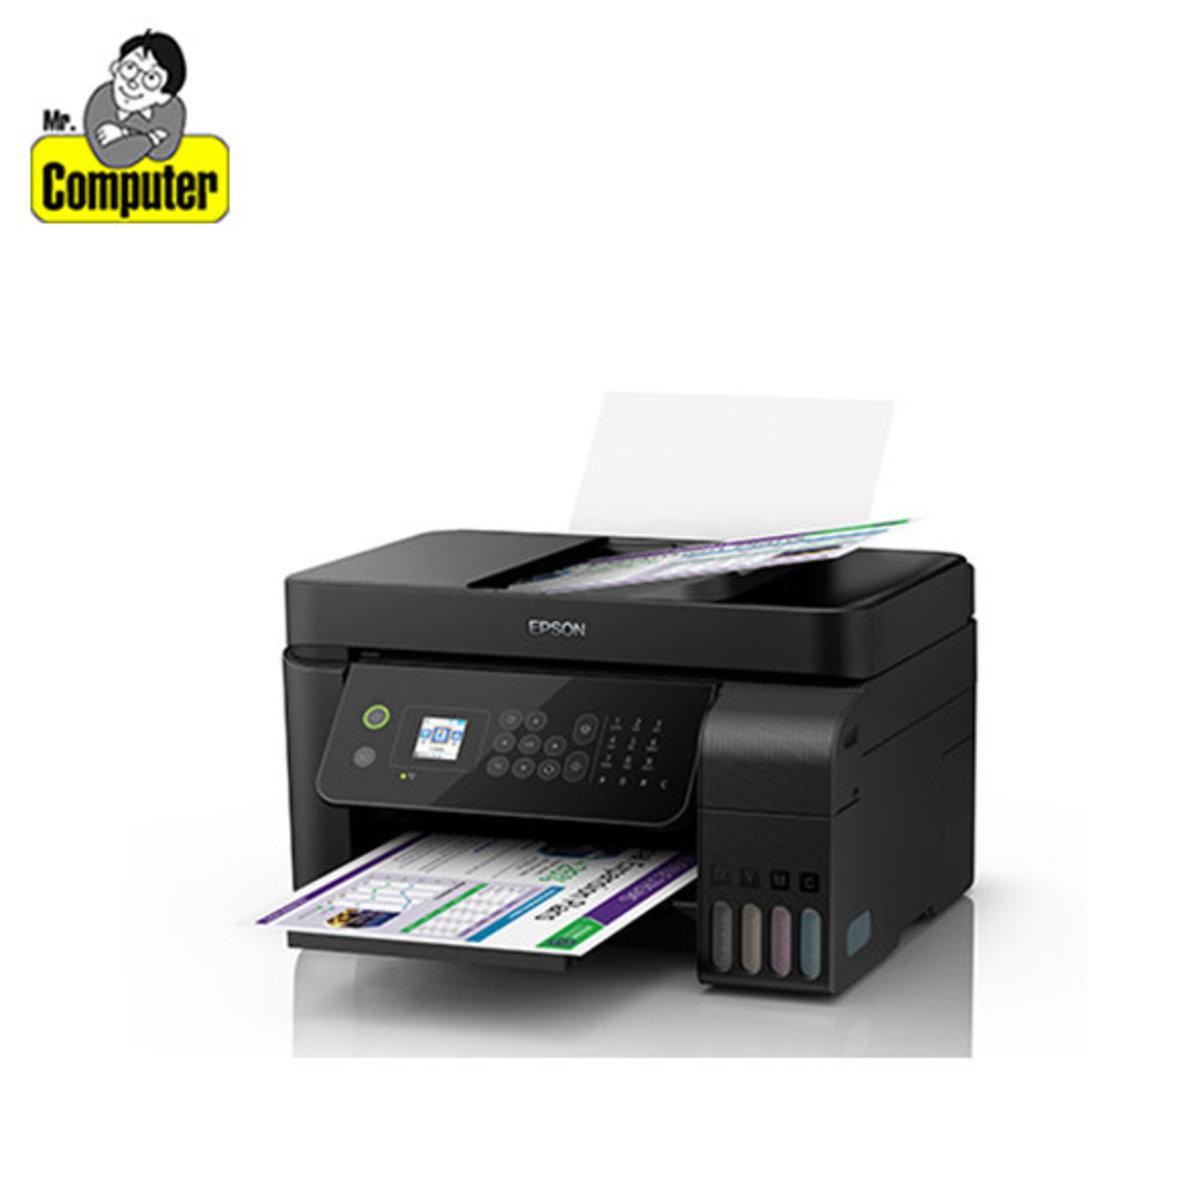 EcoTank L5190 Color Inkjet Printer with Refill Ink Tank System